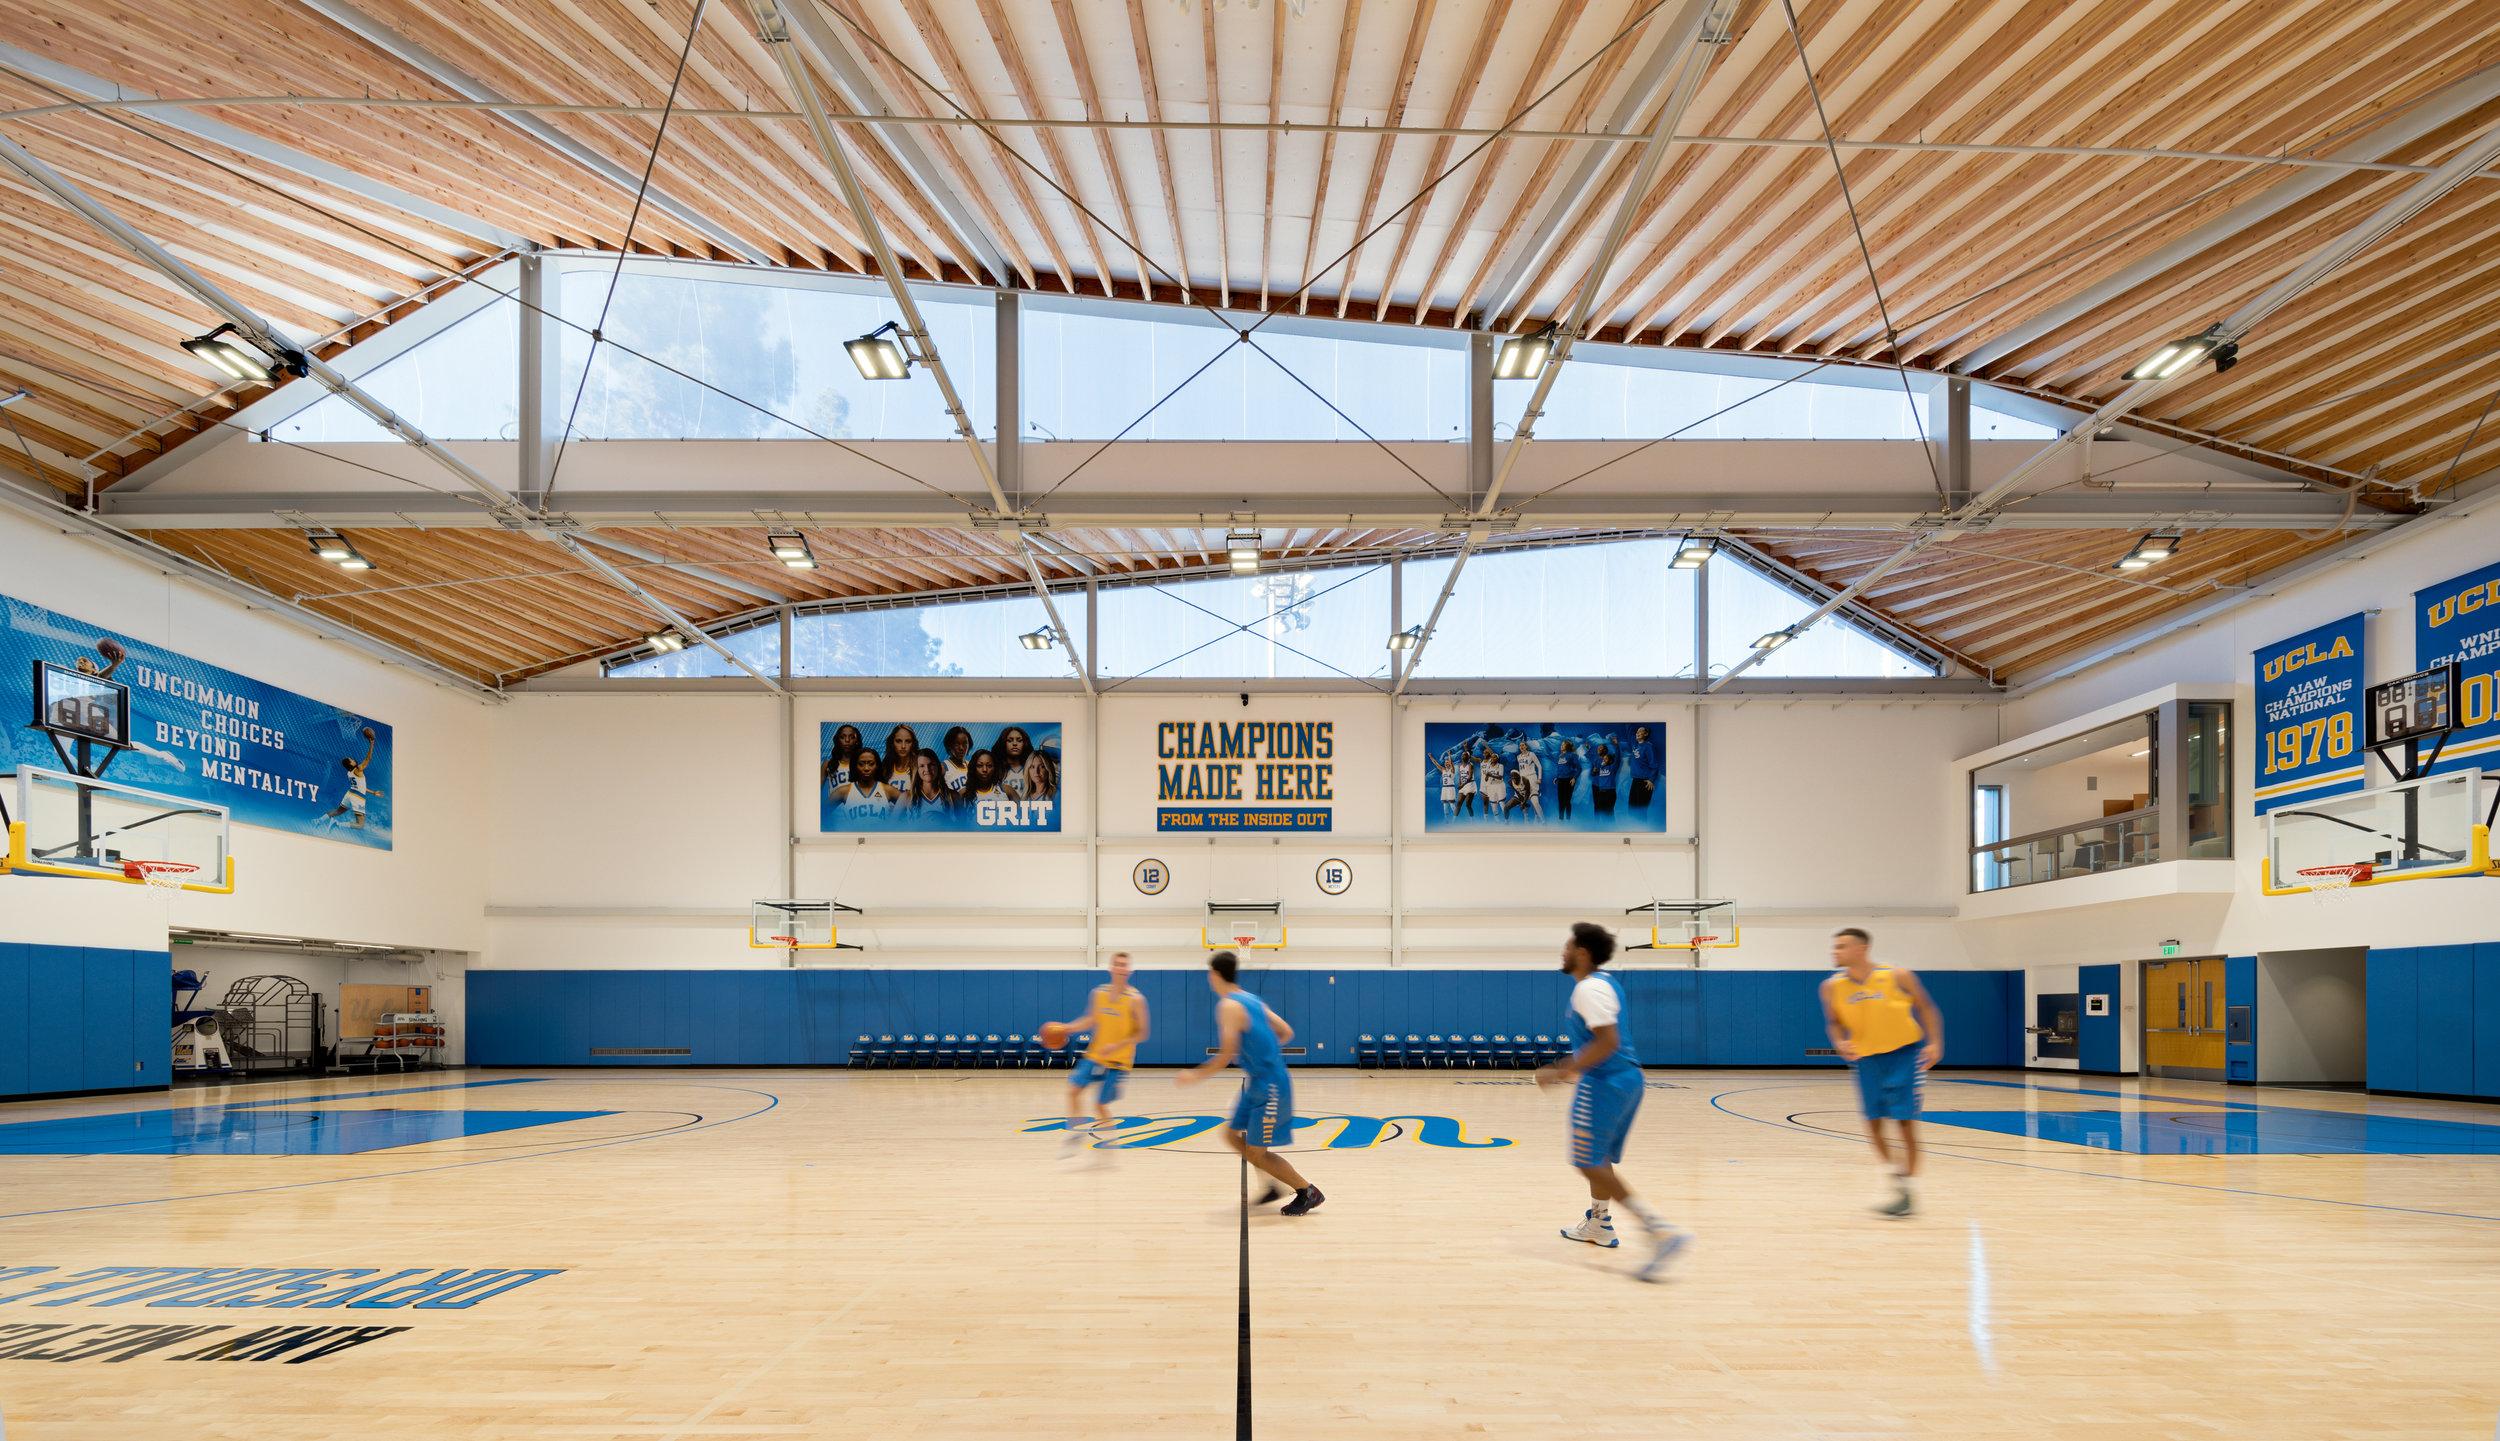 UCLA Basketball Practice Facility